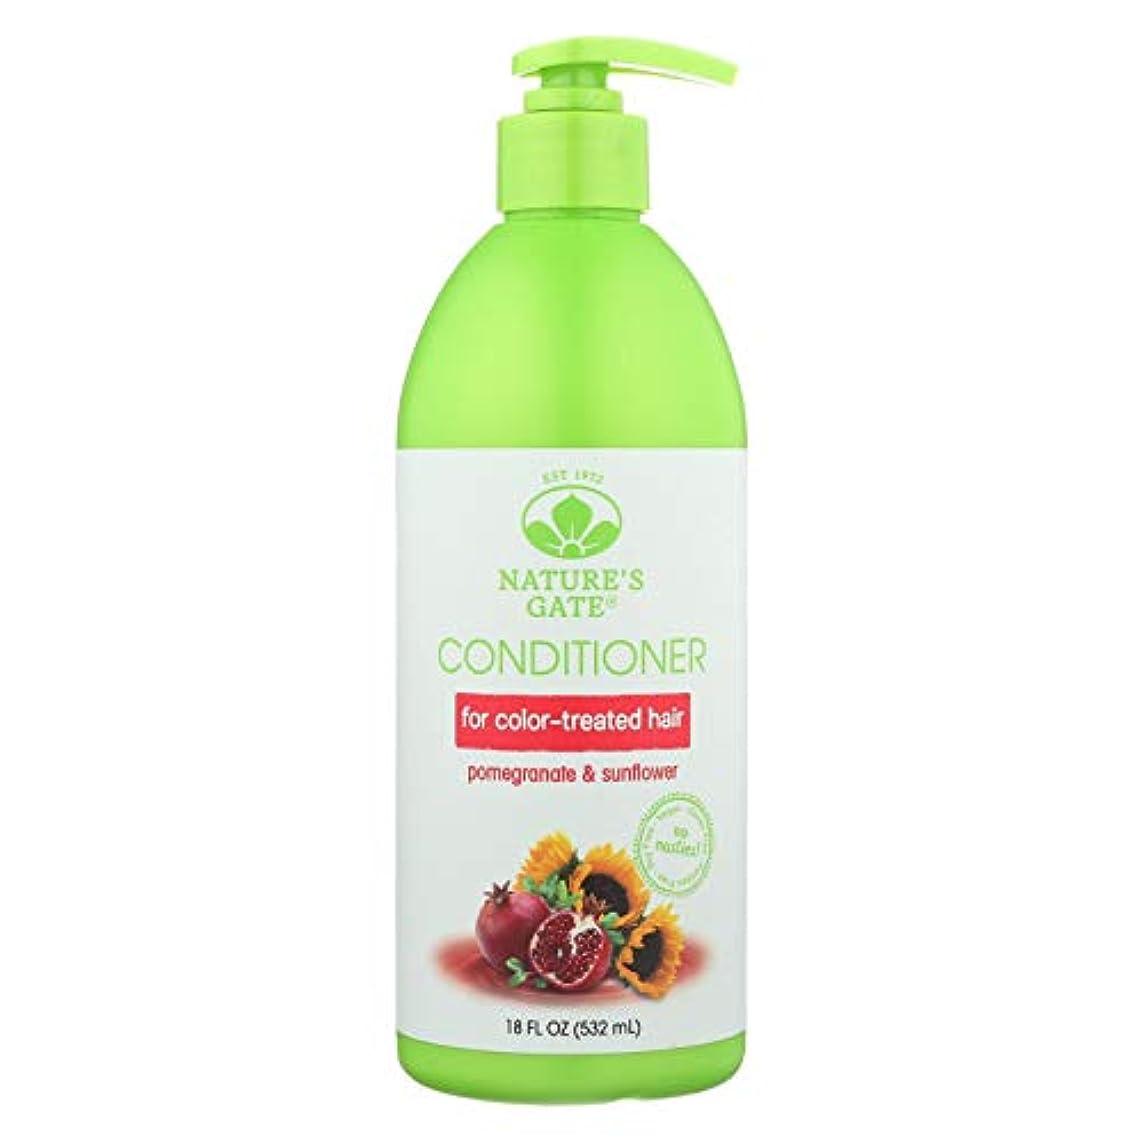 Nature's Gate, Conditioner, Hair Defense, Pomegranate Sunflower, 18 fl oz (532 ml)